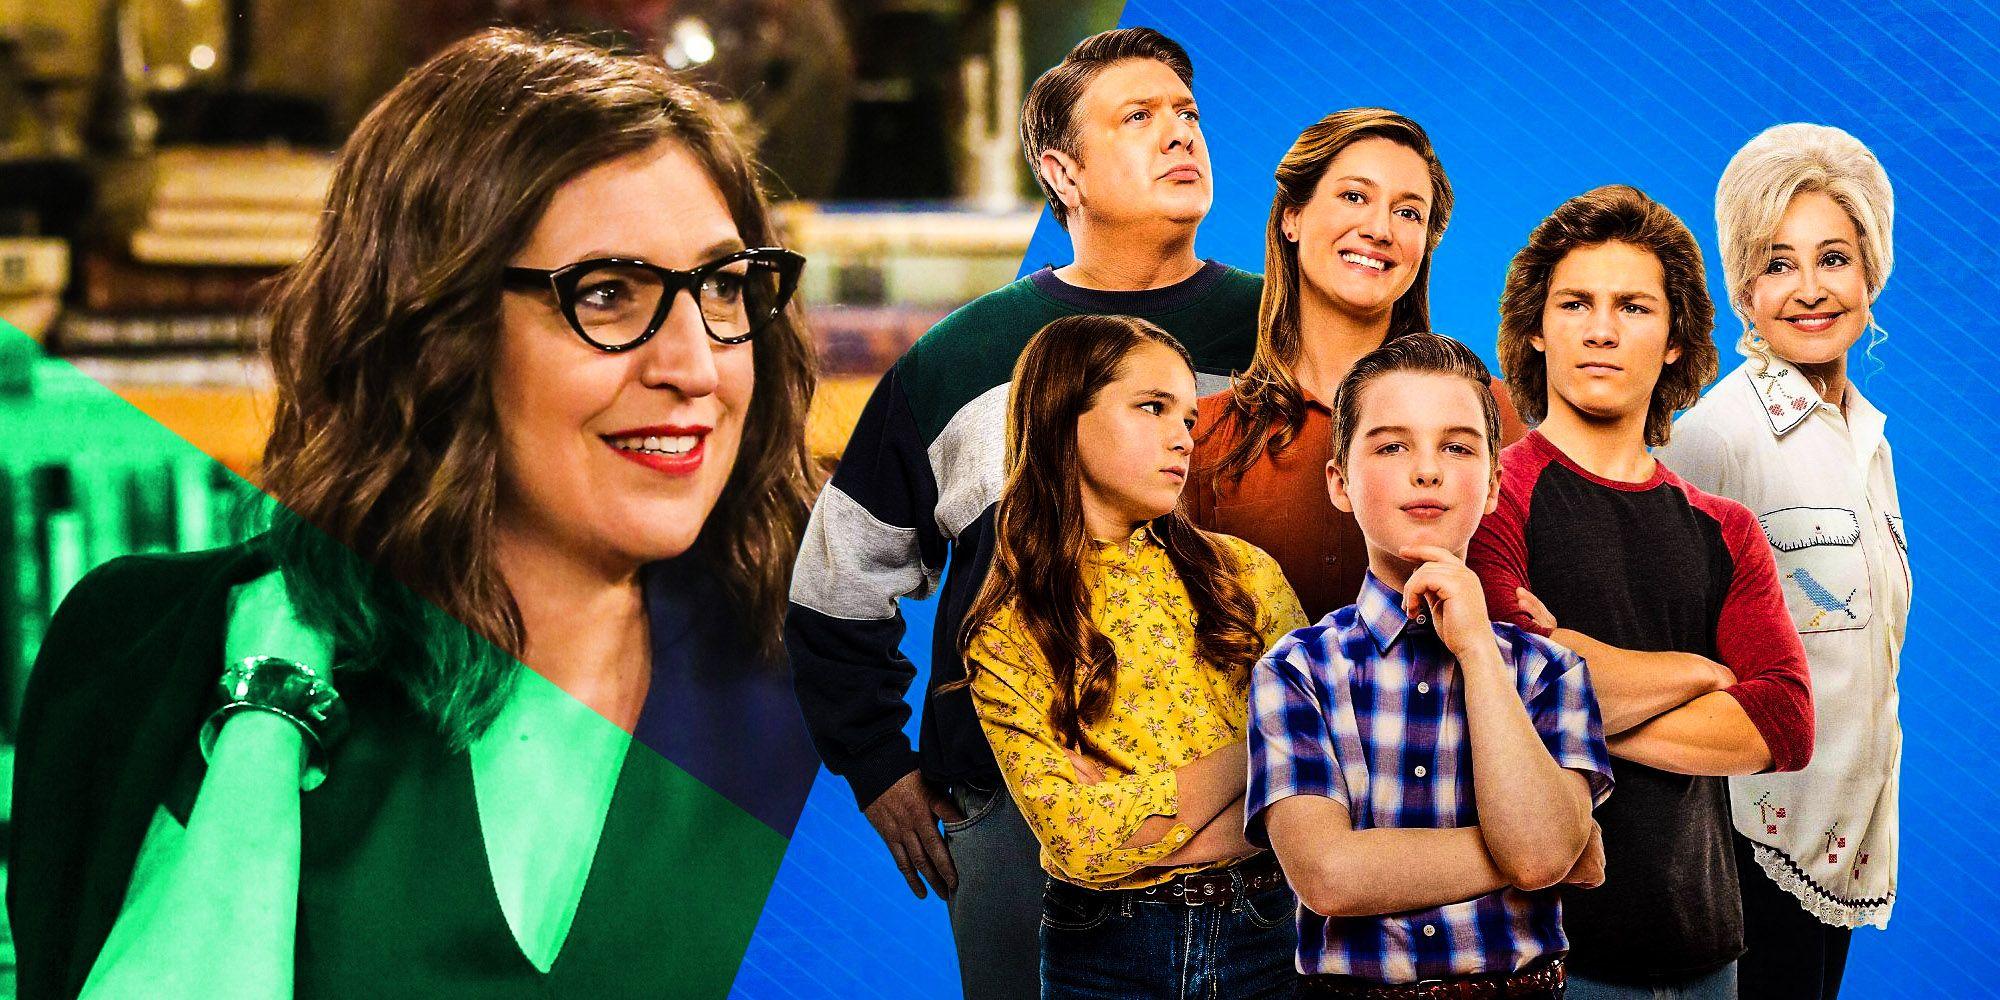 Young Sheldon Foreshadows Sheldon & Amy's Relationship In Big Bang Theory